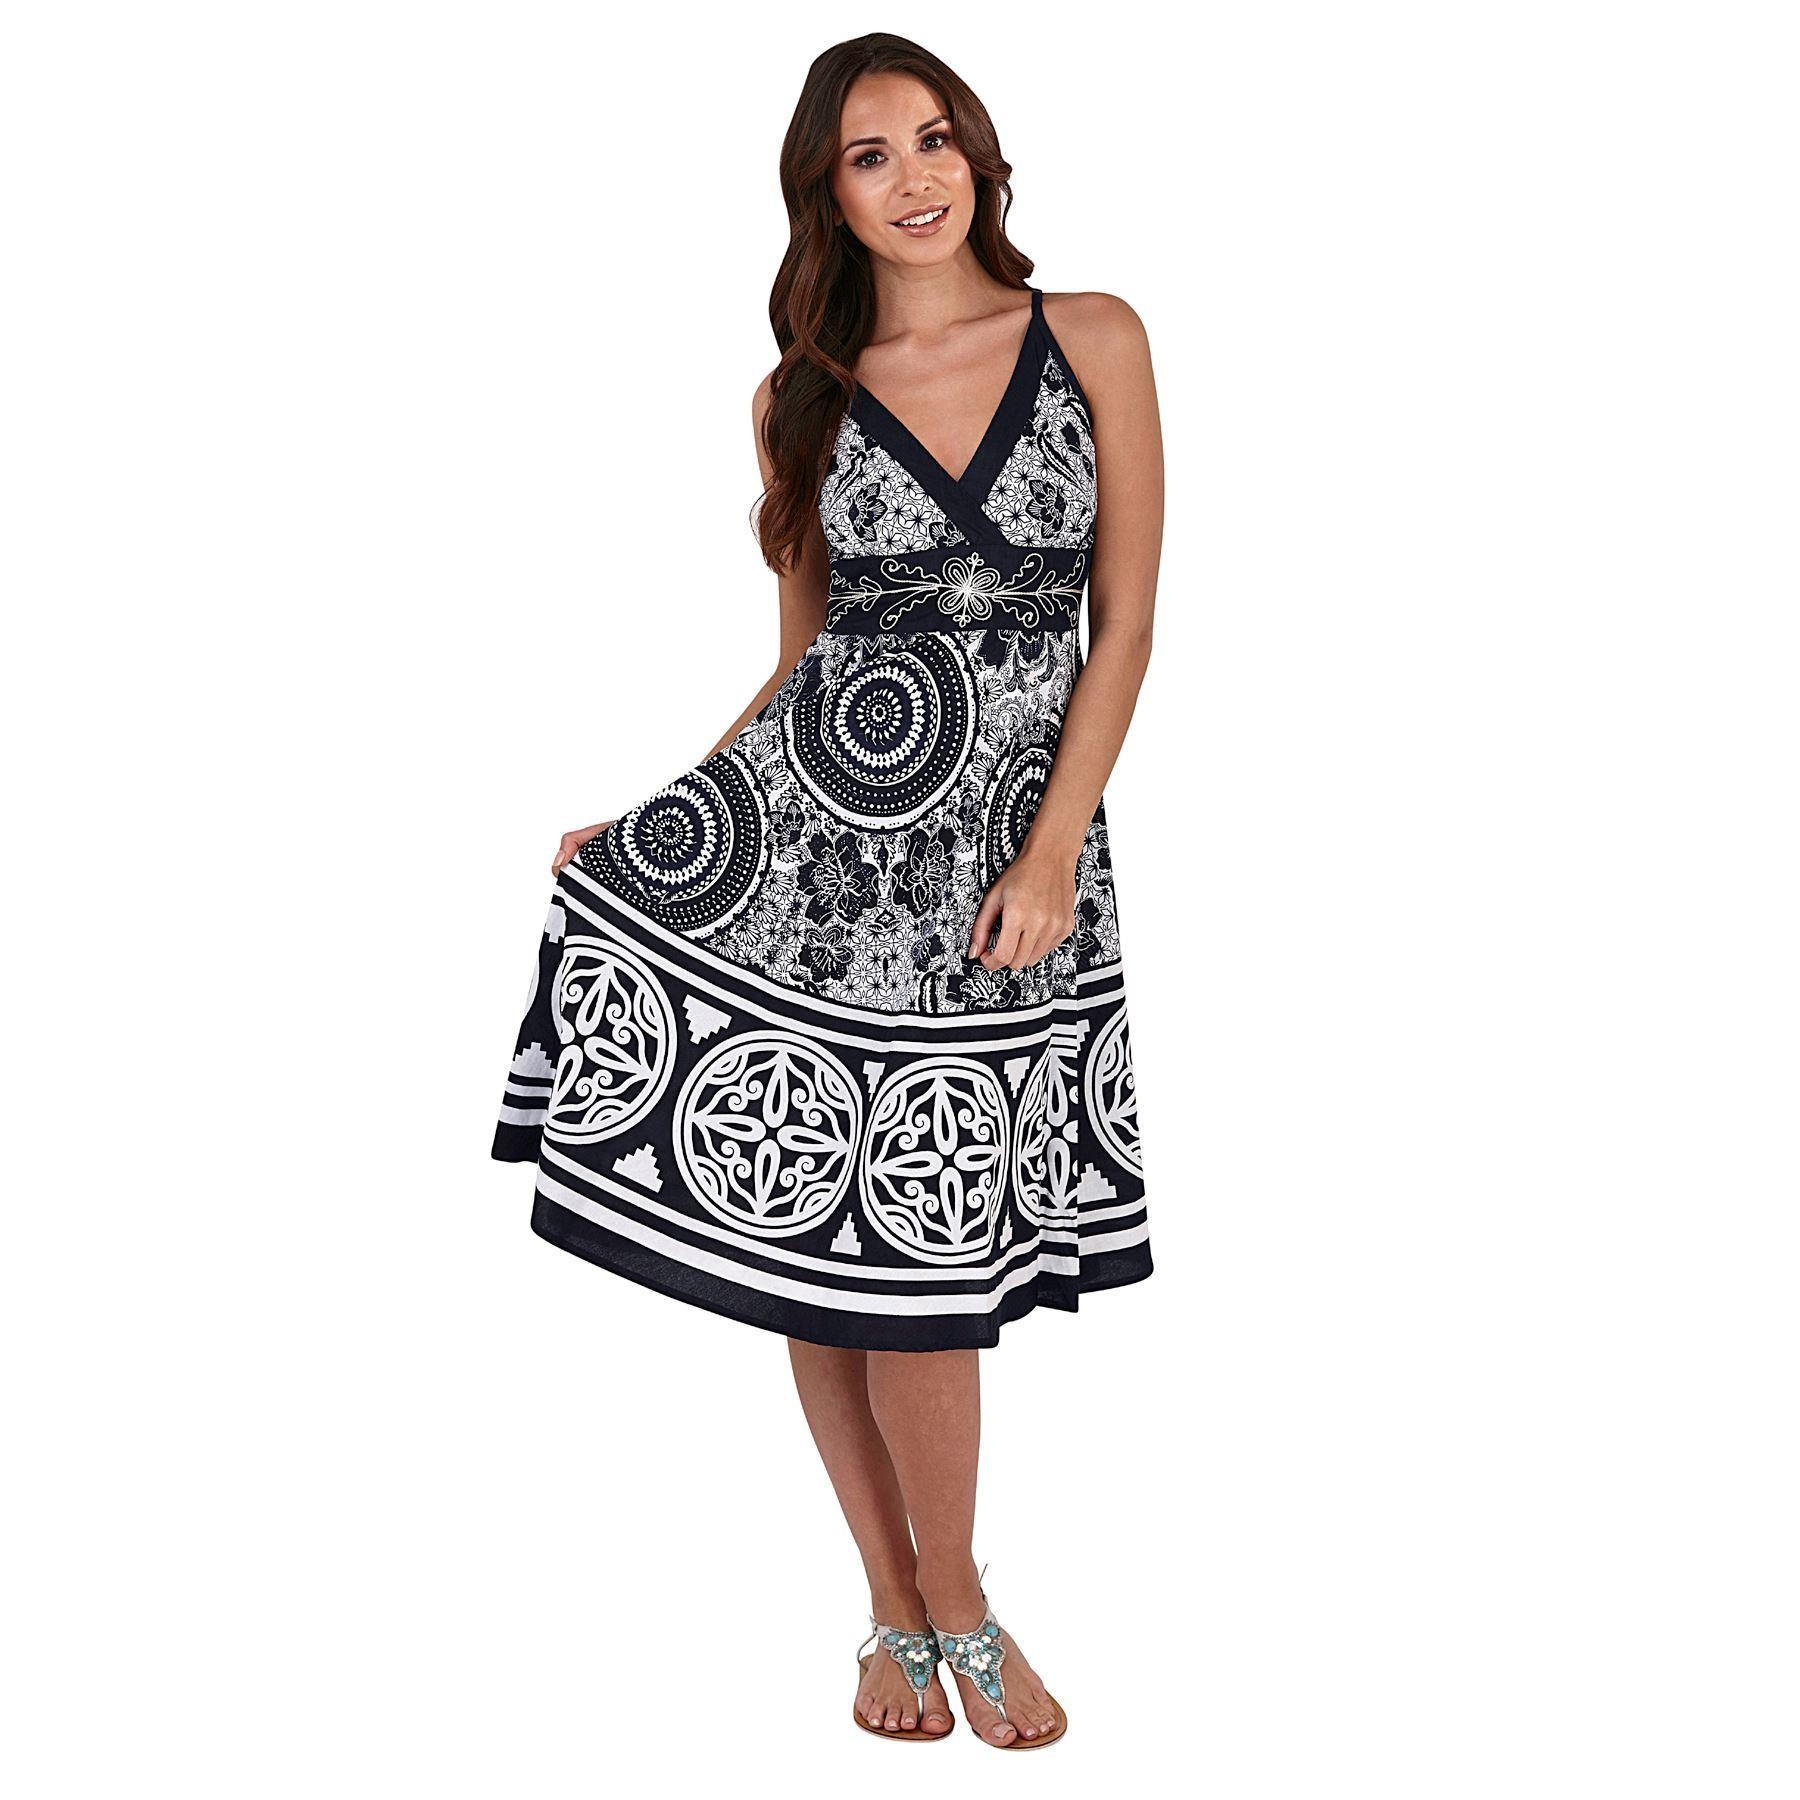 Pistachio Pattern Crossover Dress - Navy